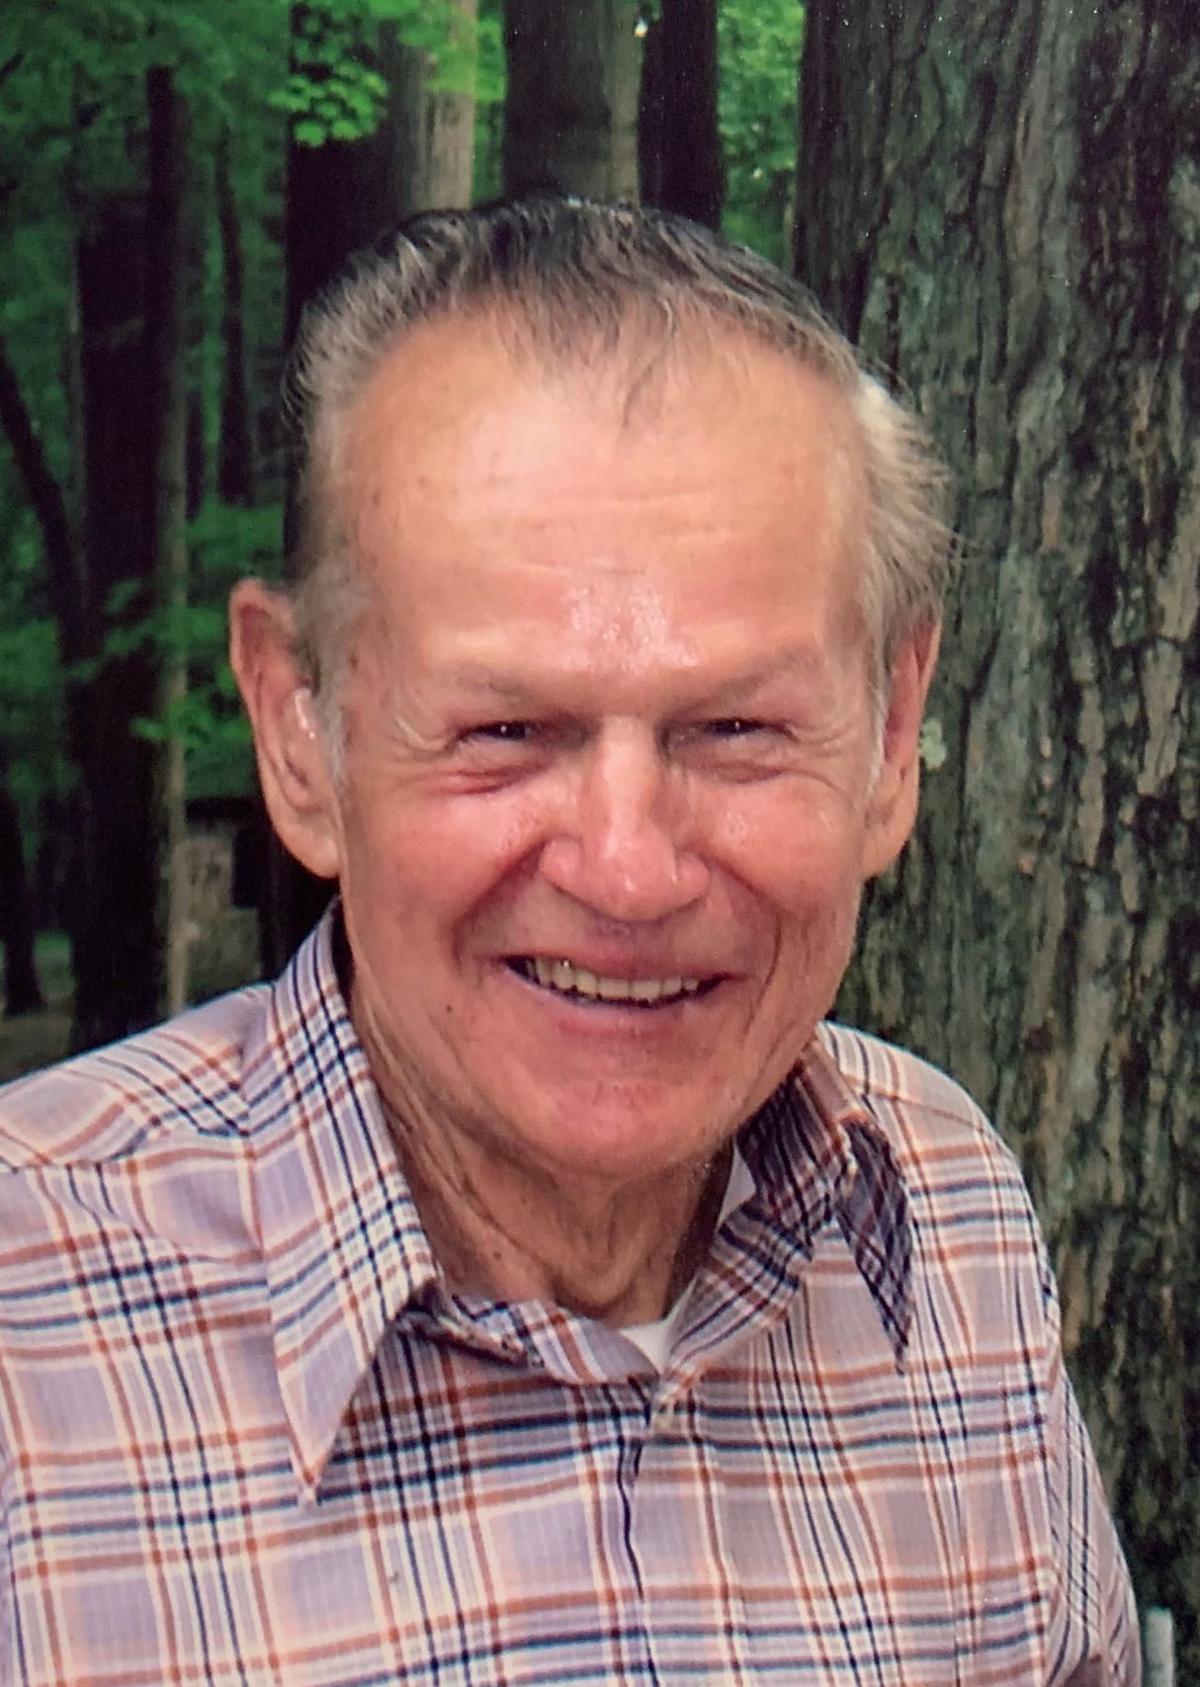 Donald Groves